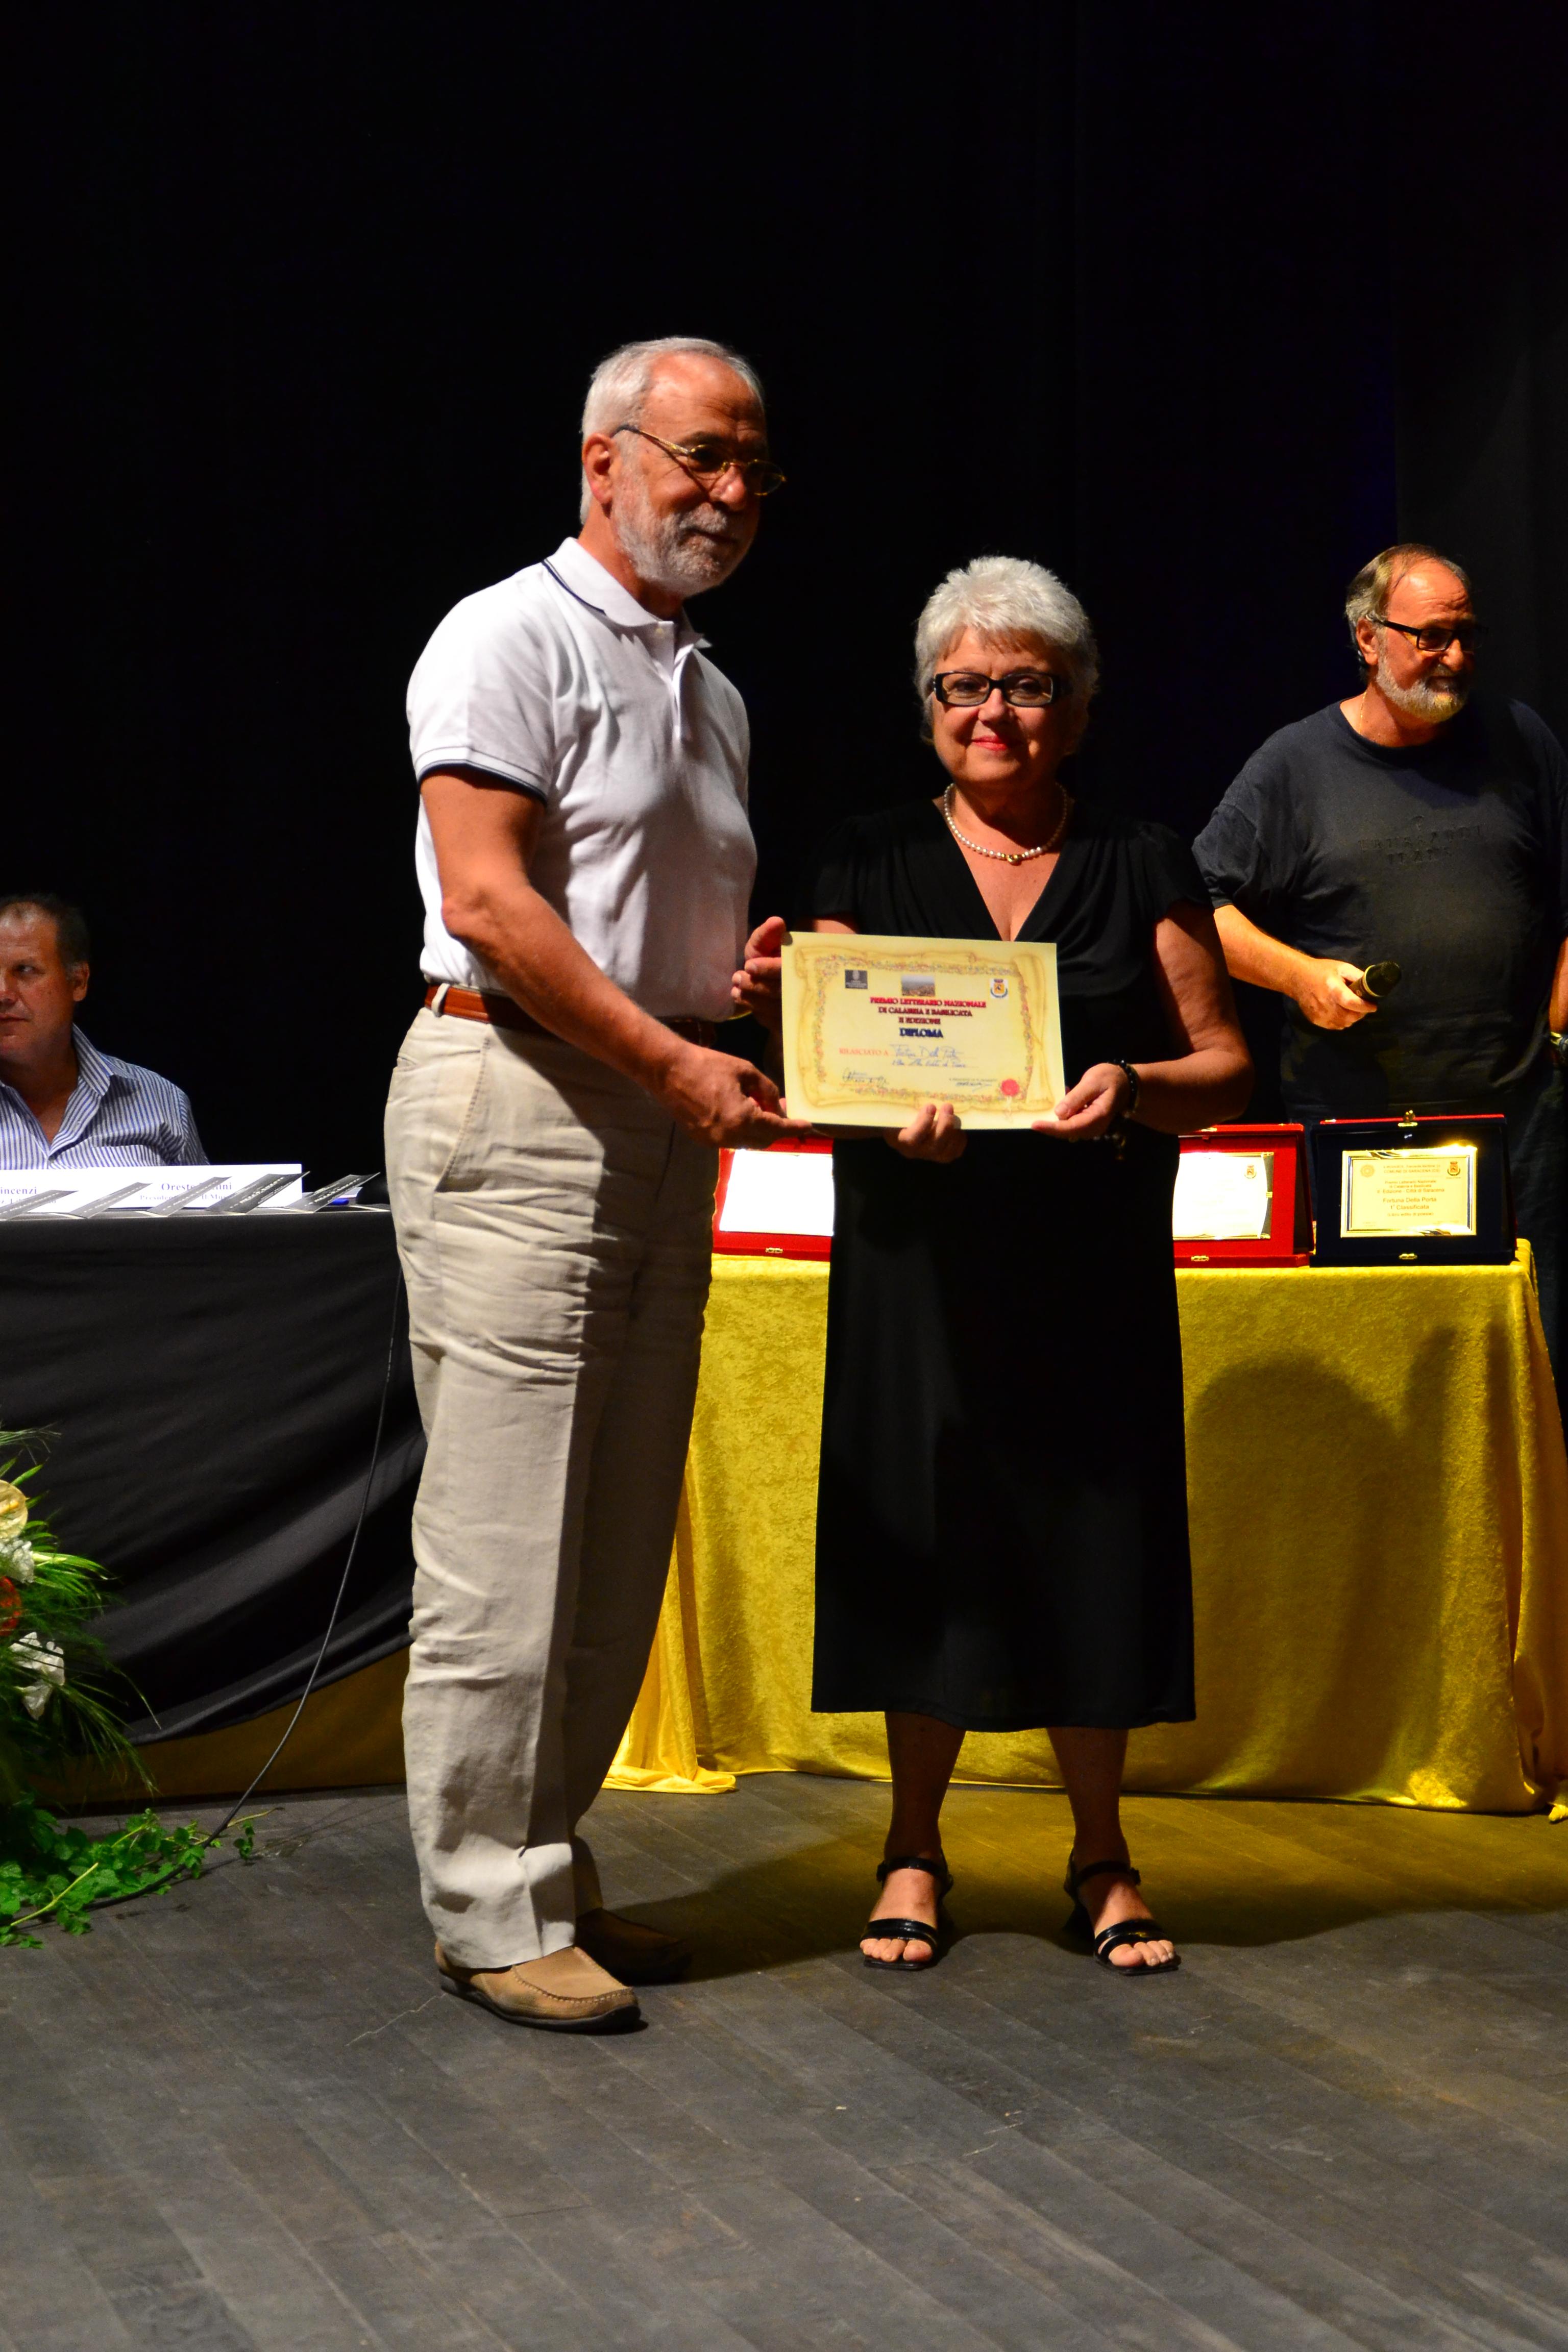 Premio di Calabria e Basilicata - Città di Saracena